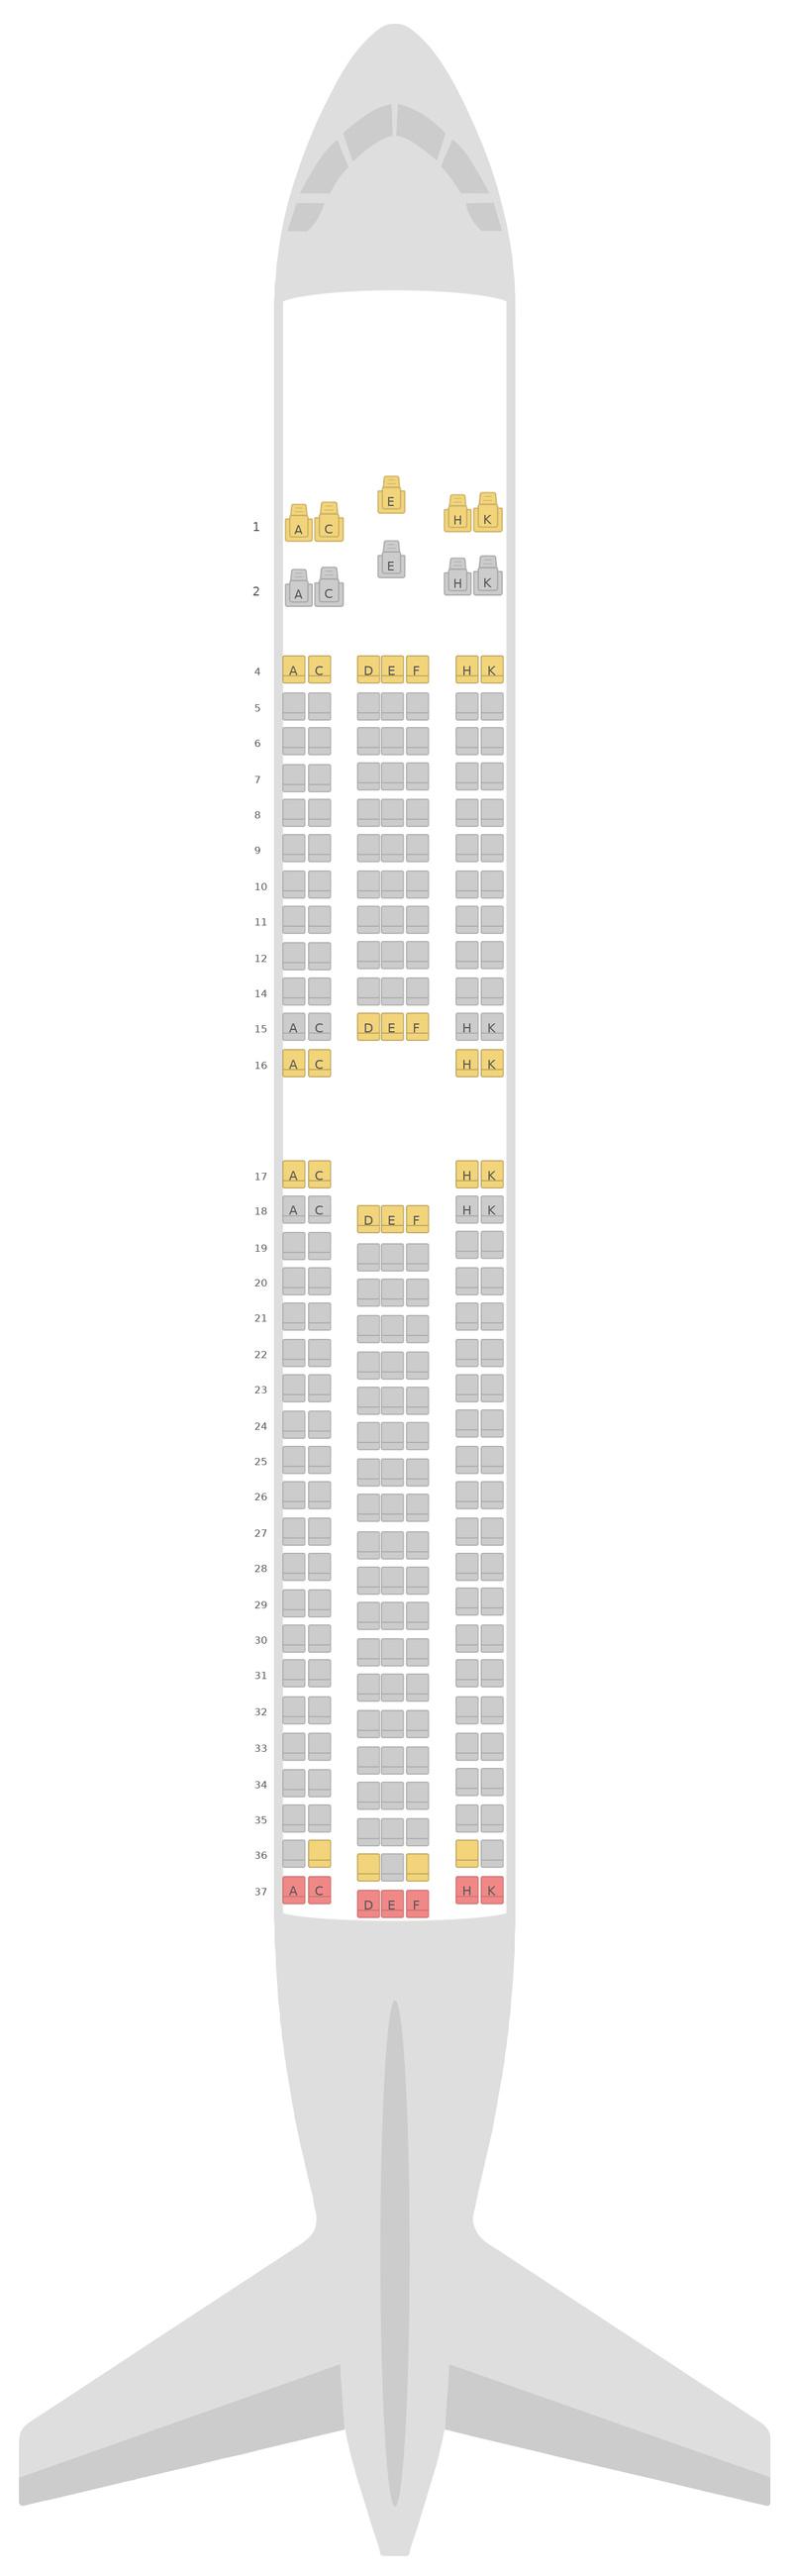 Sitzplan Boeing 767-300ER v1 Royal Air Maroc